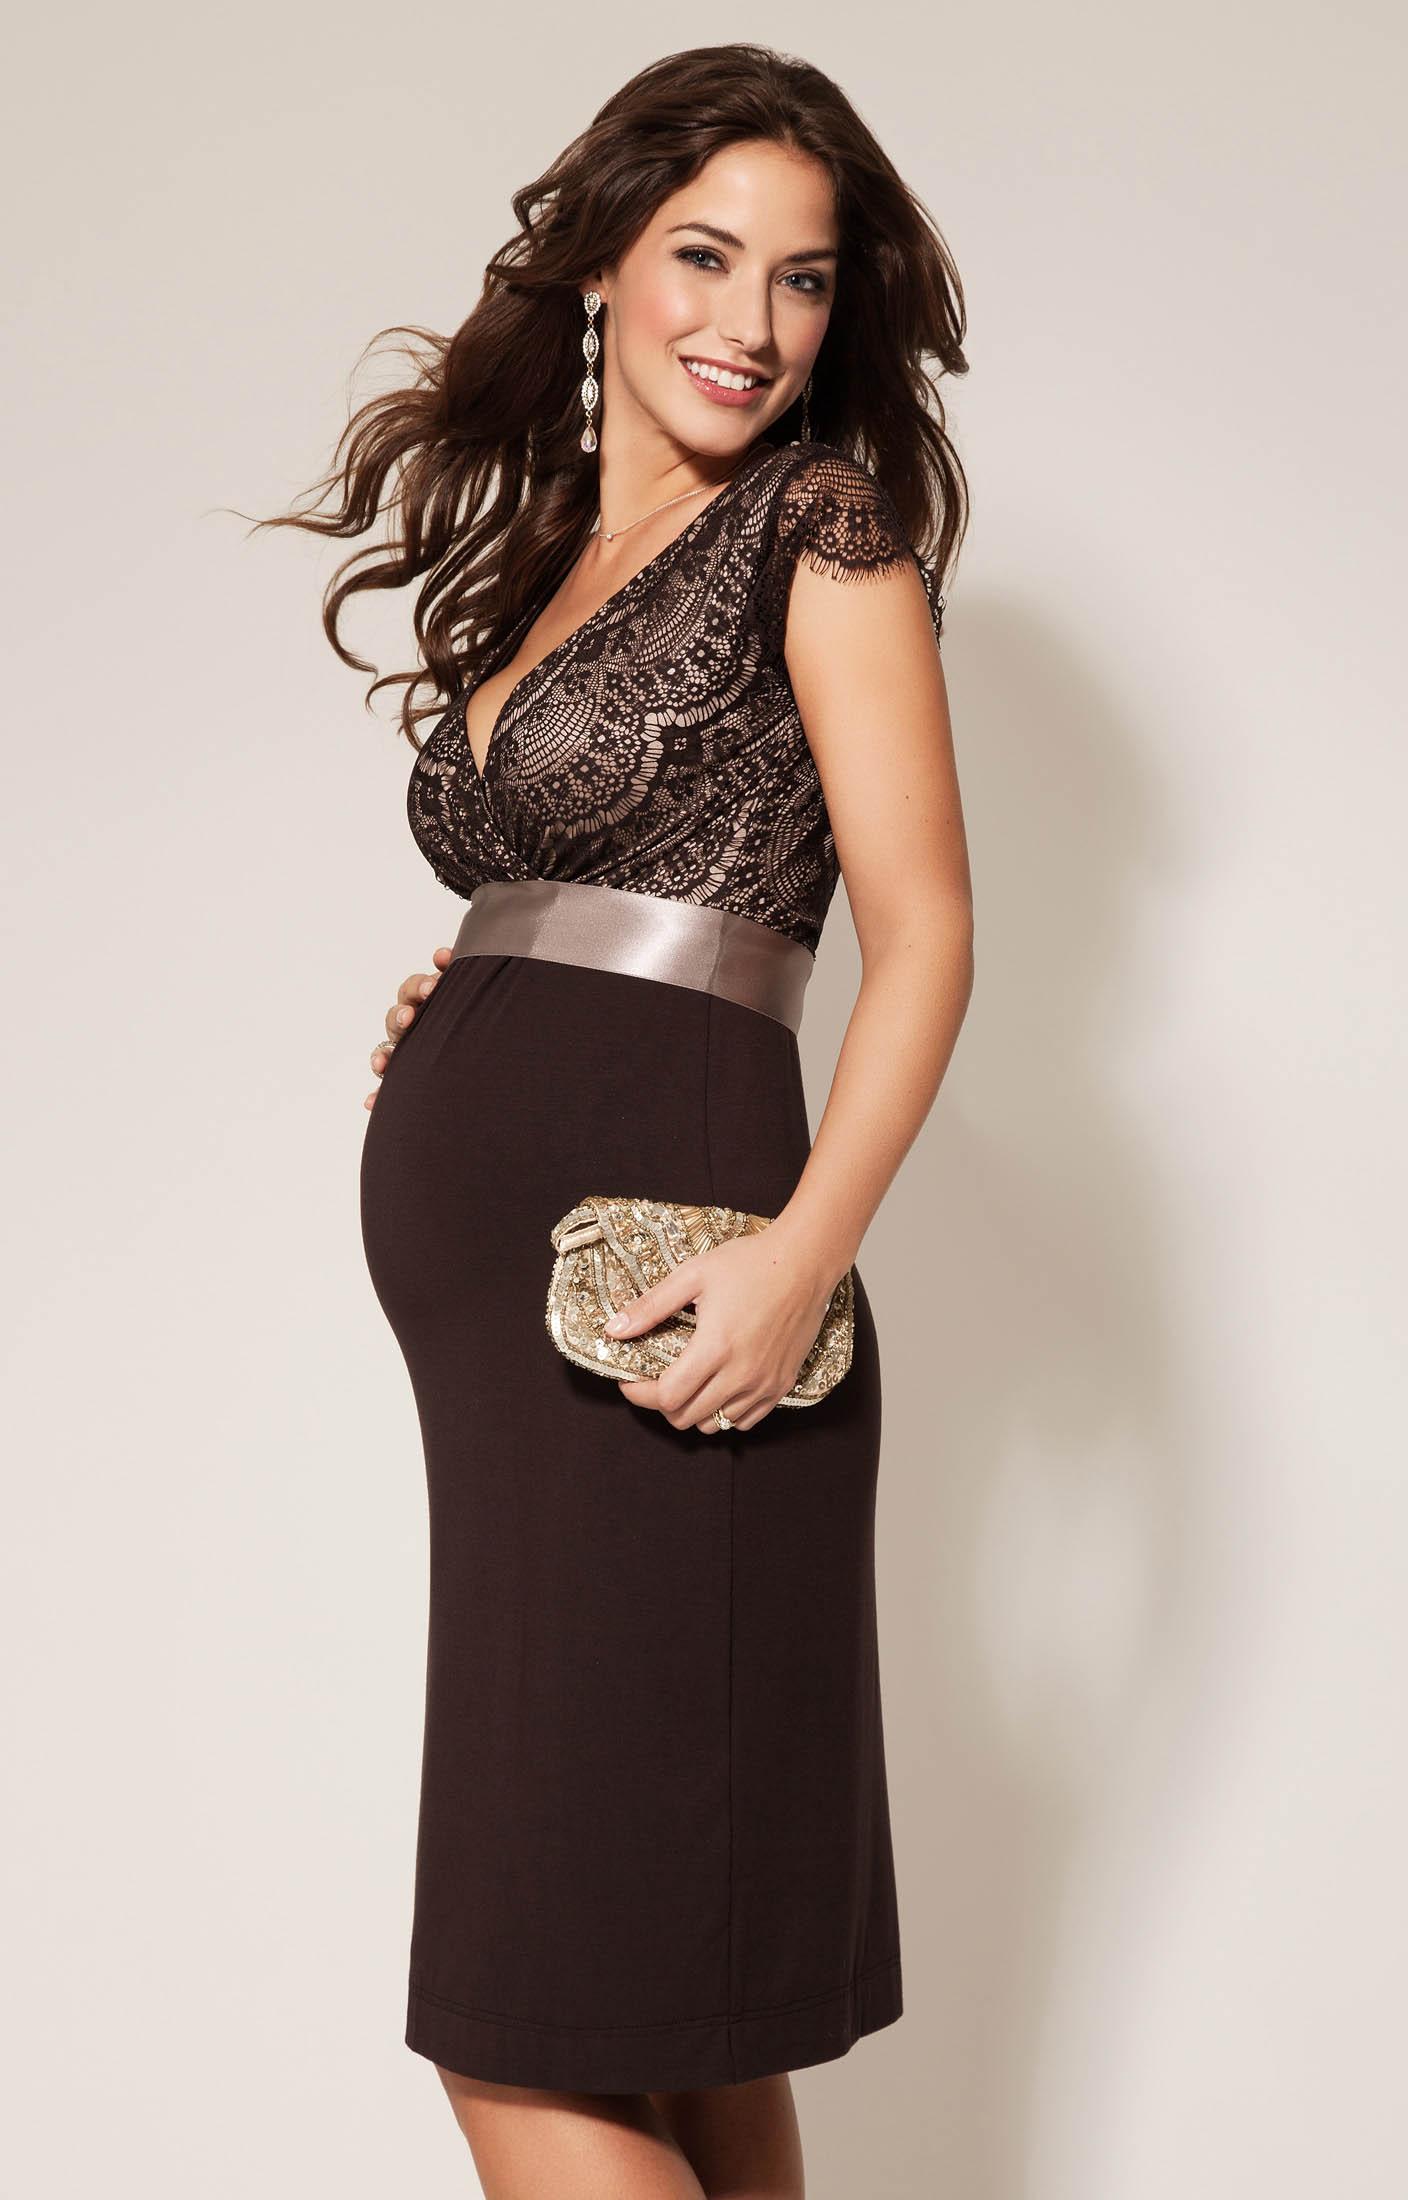 d835f2568e5bc Maternity Dresses Uk - Dress Foto and Picture